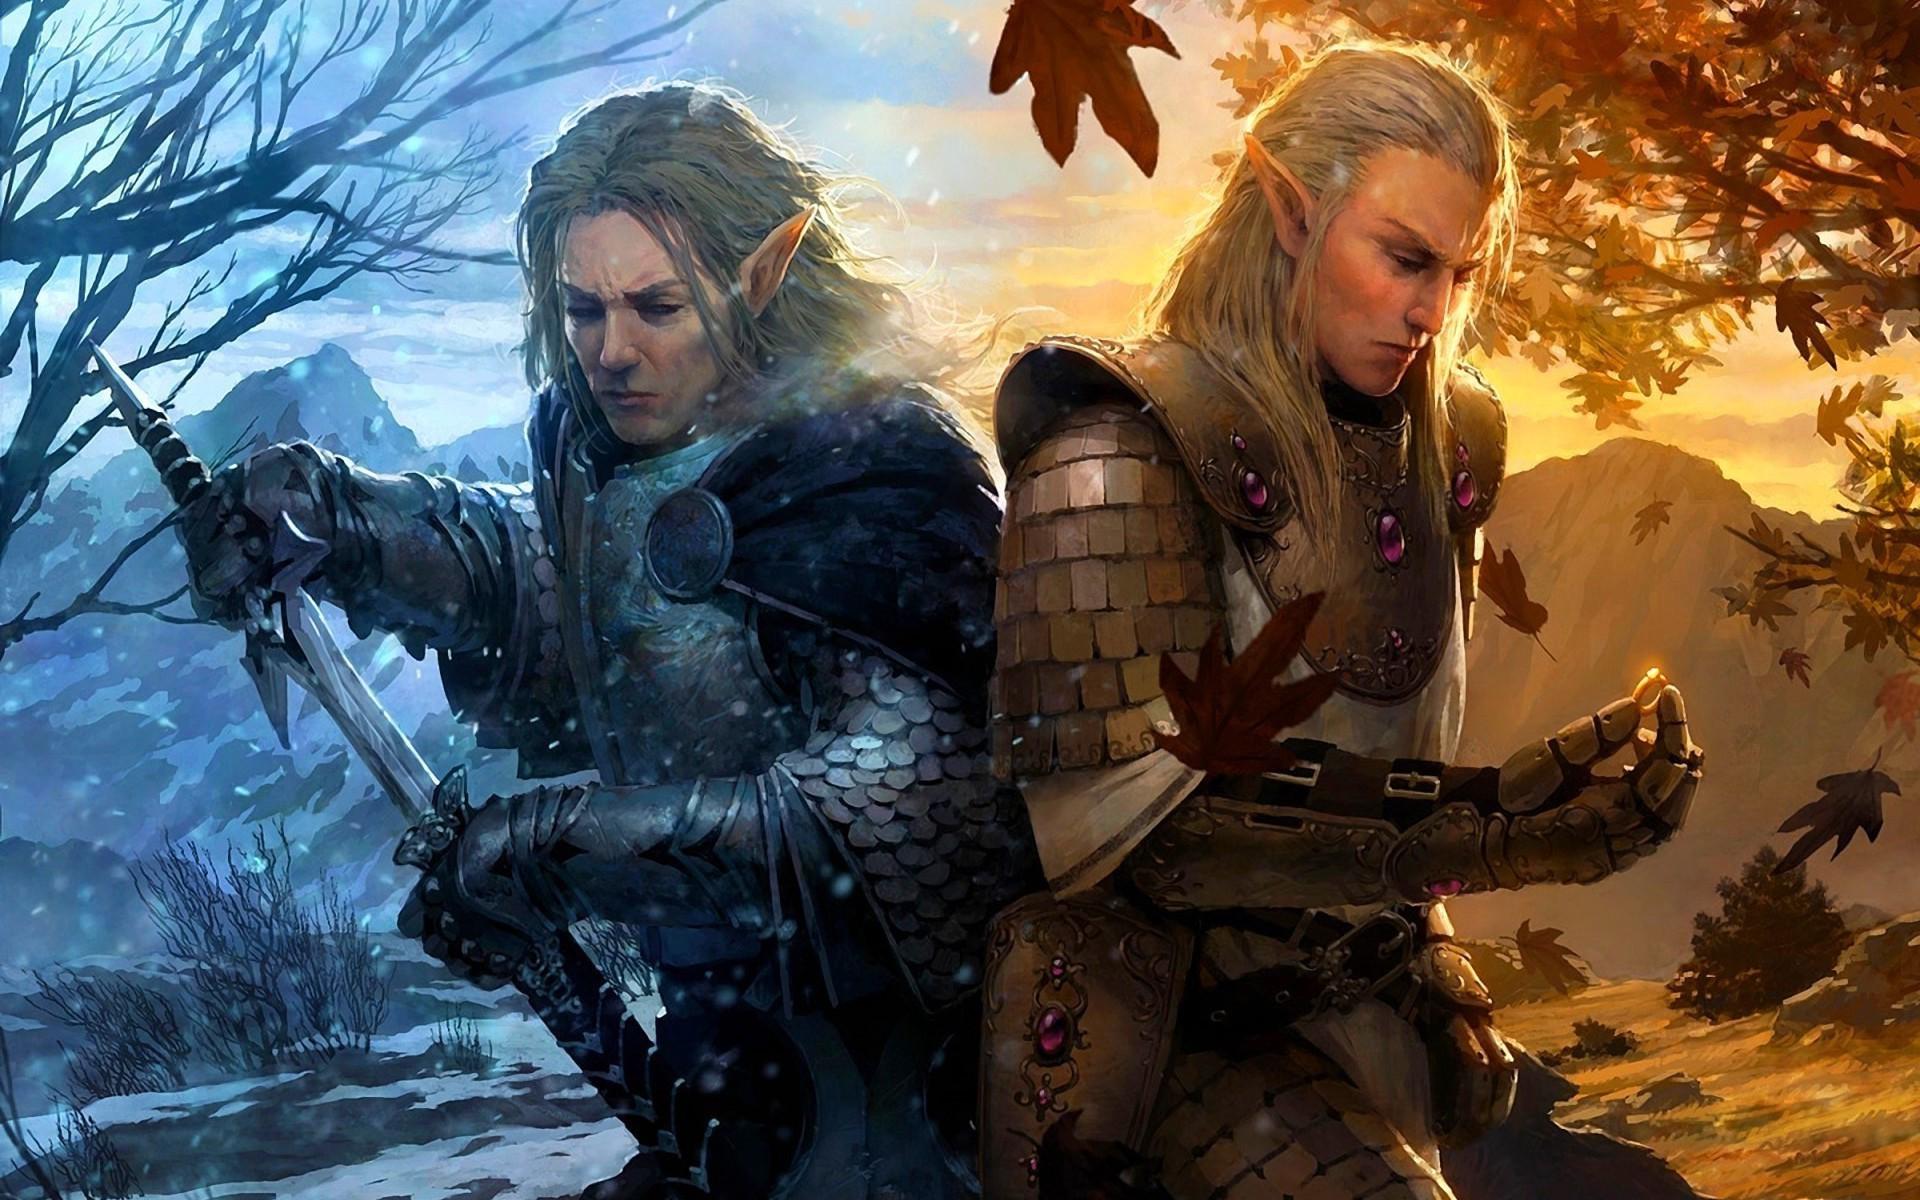 Archer Warrior Elves Fantasy Art Wallpapers Hd: Male Elf Wallpaper (68+ Images